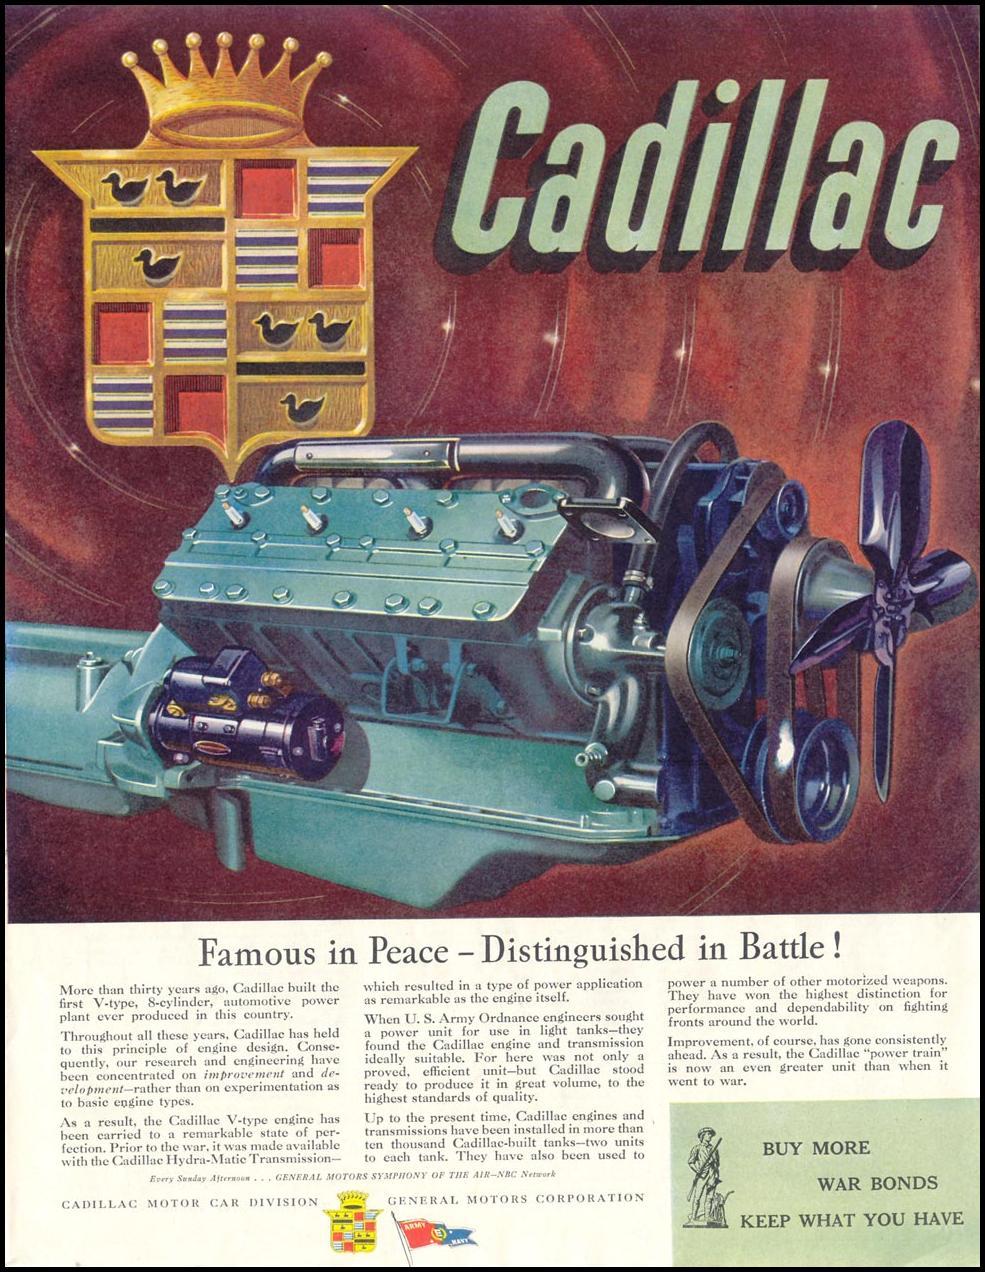 CADILLAC WAR PRODUCTION SATURDAY EVENING POST 05/19/1945 p. 31